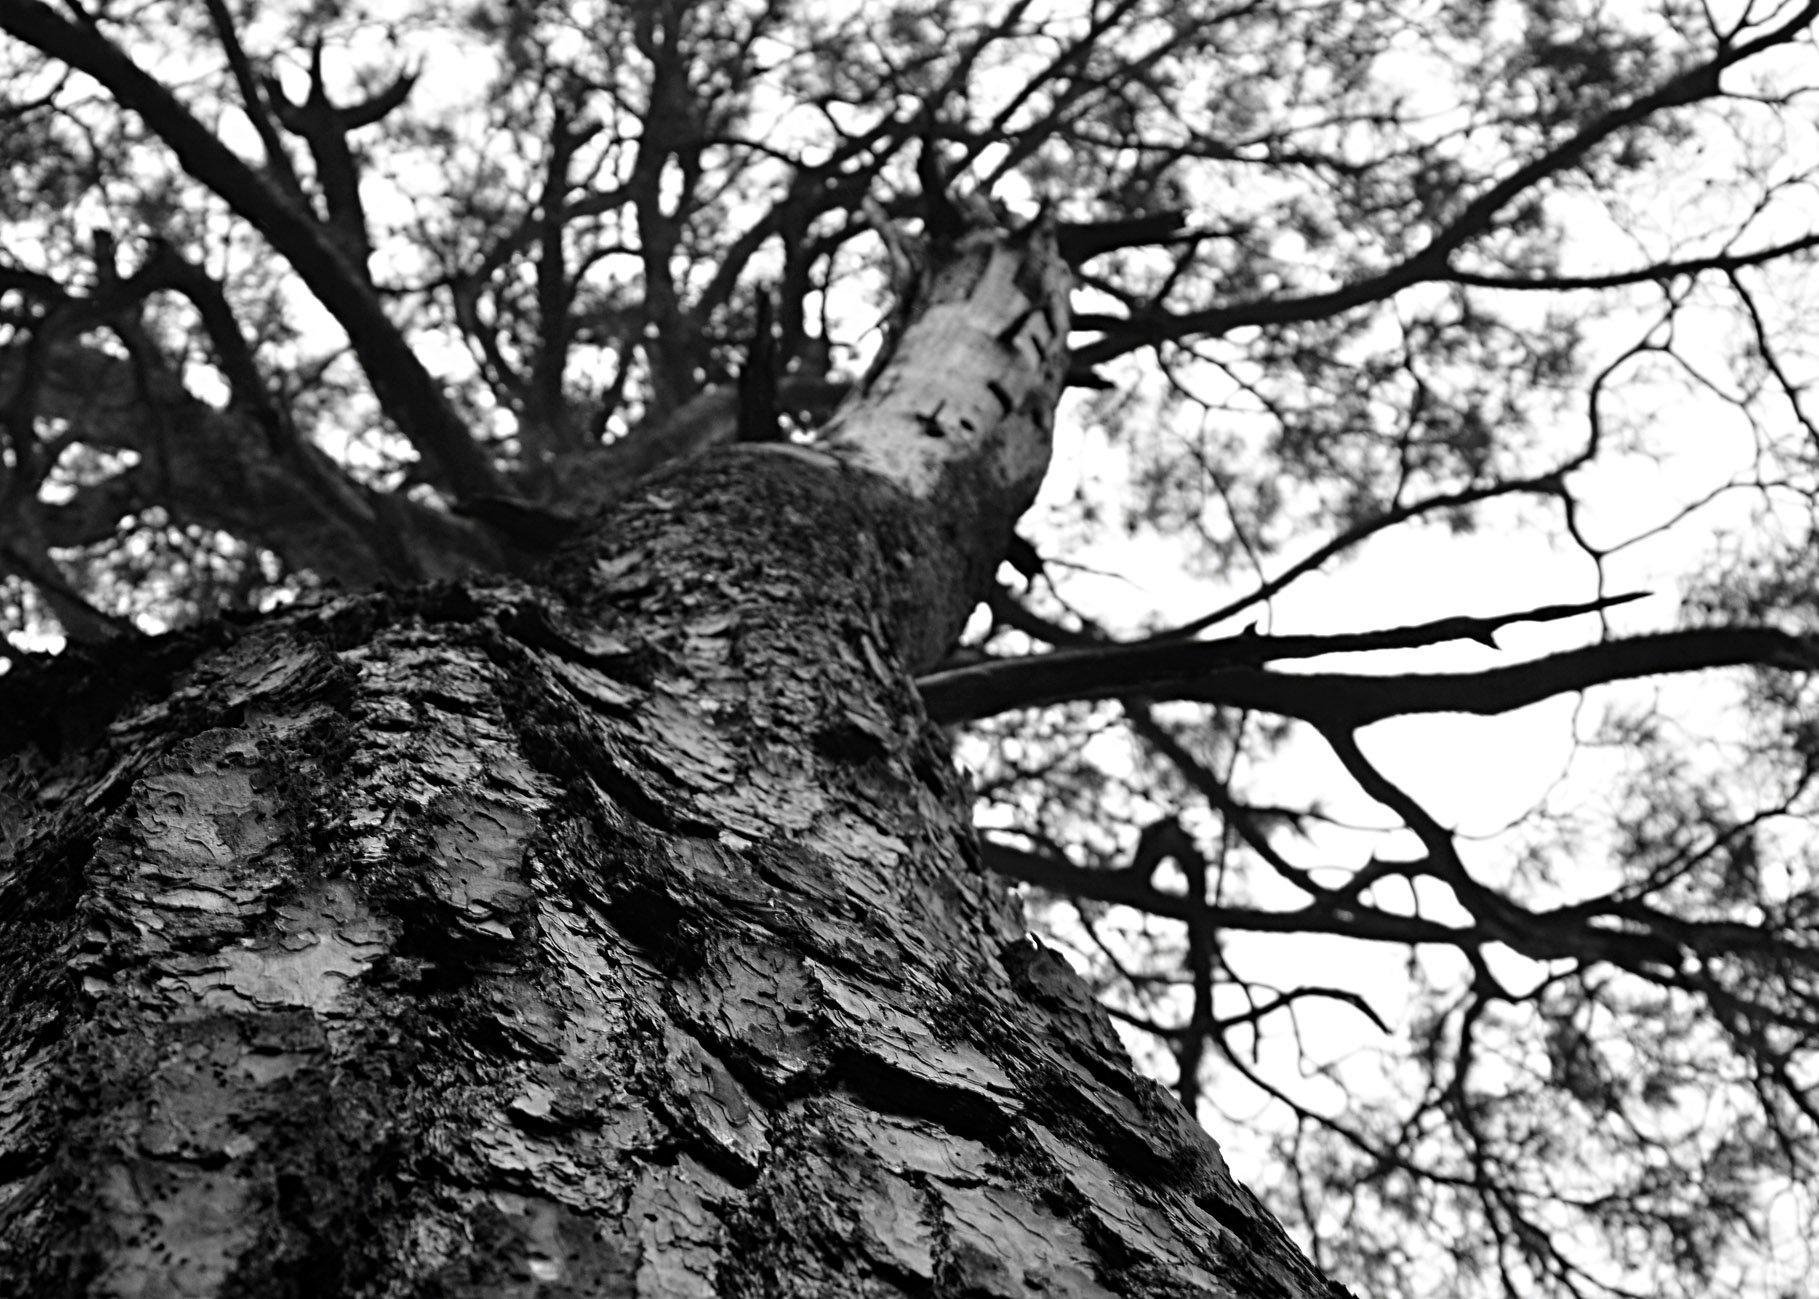 belemedik ağaç